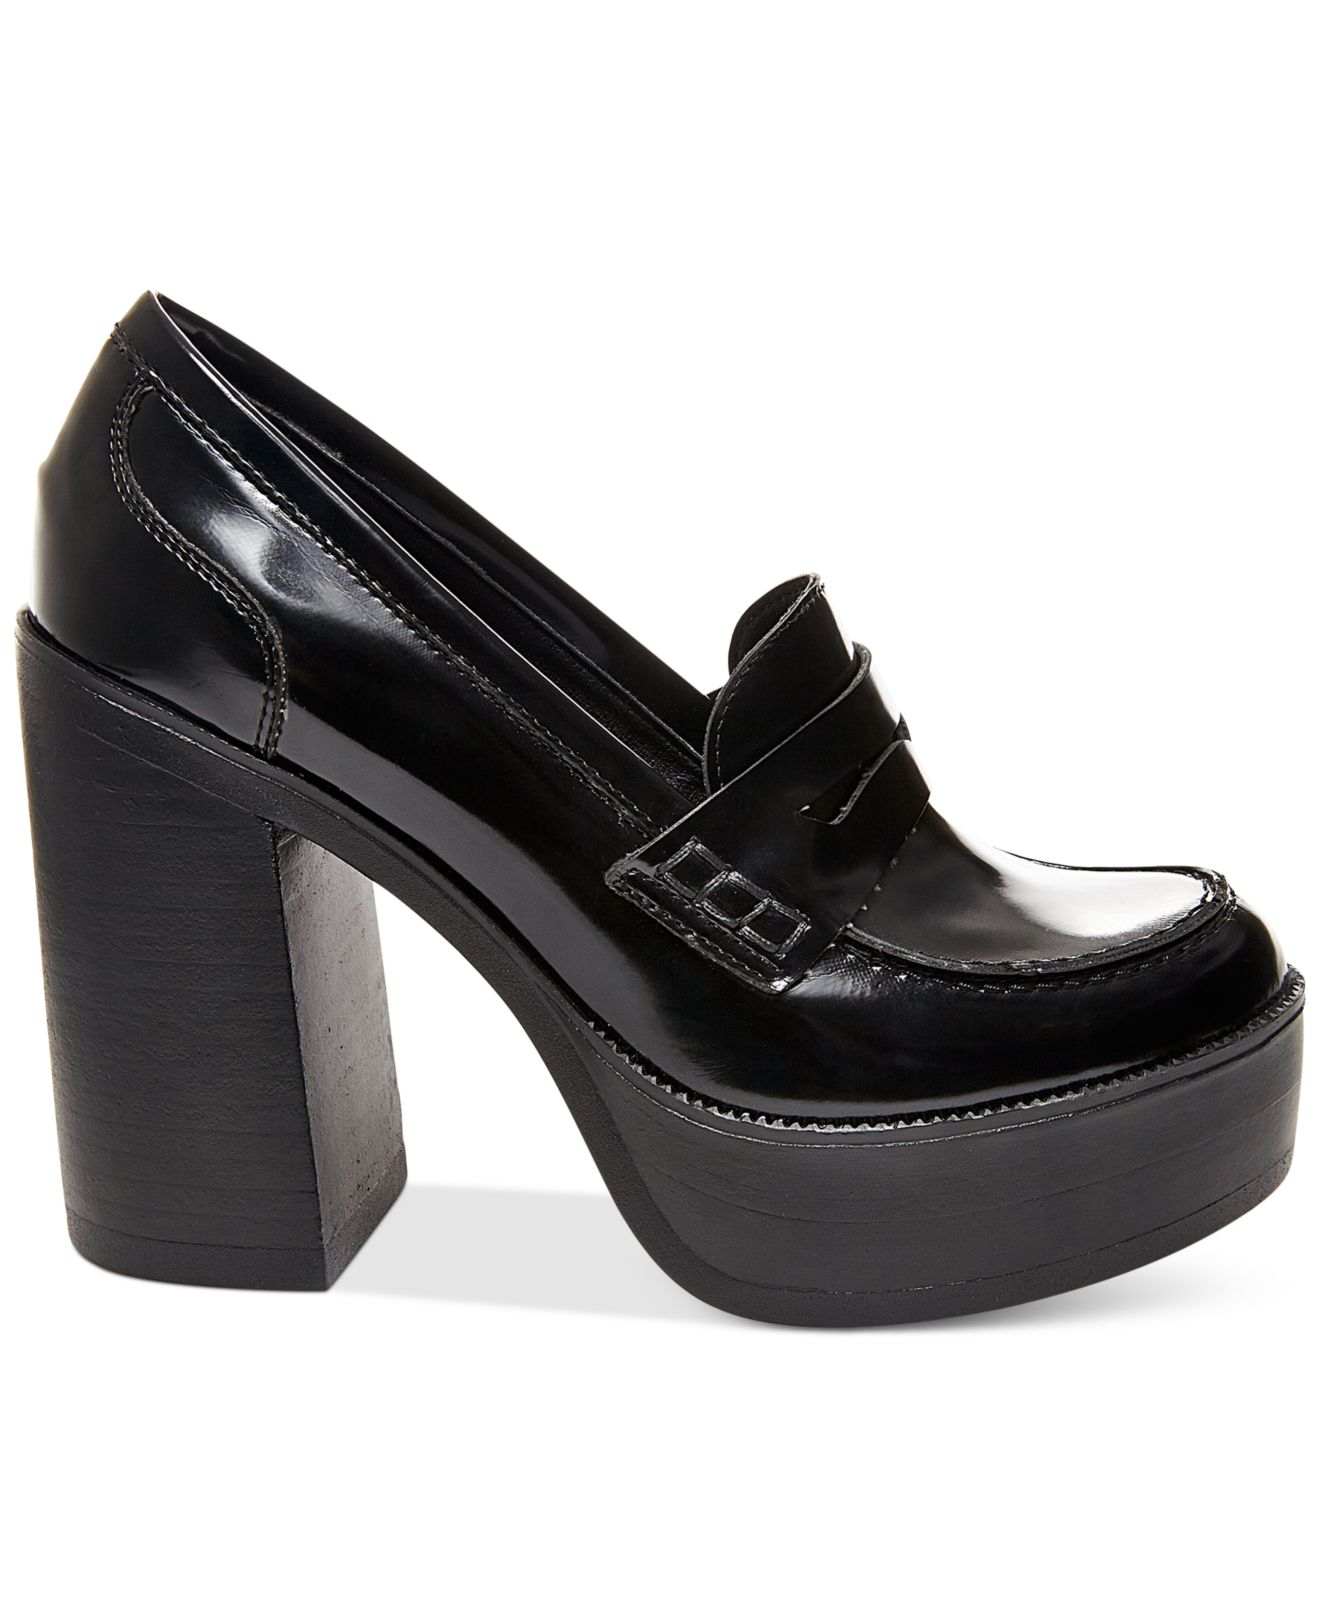 Lyst - Steve Madden Women s Juniper Platform Penny Loafers in Black